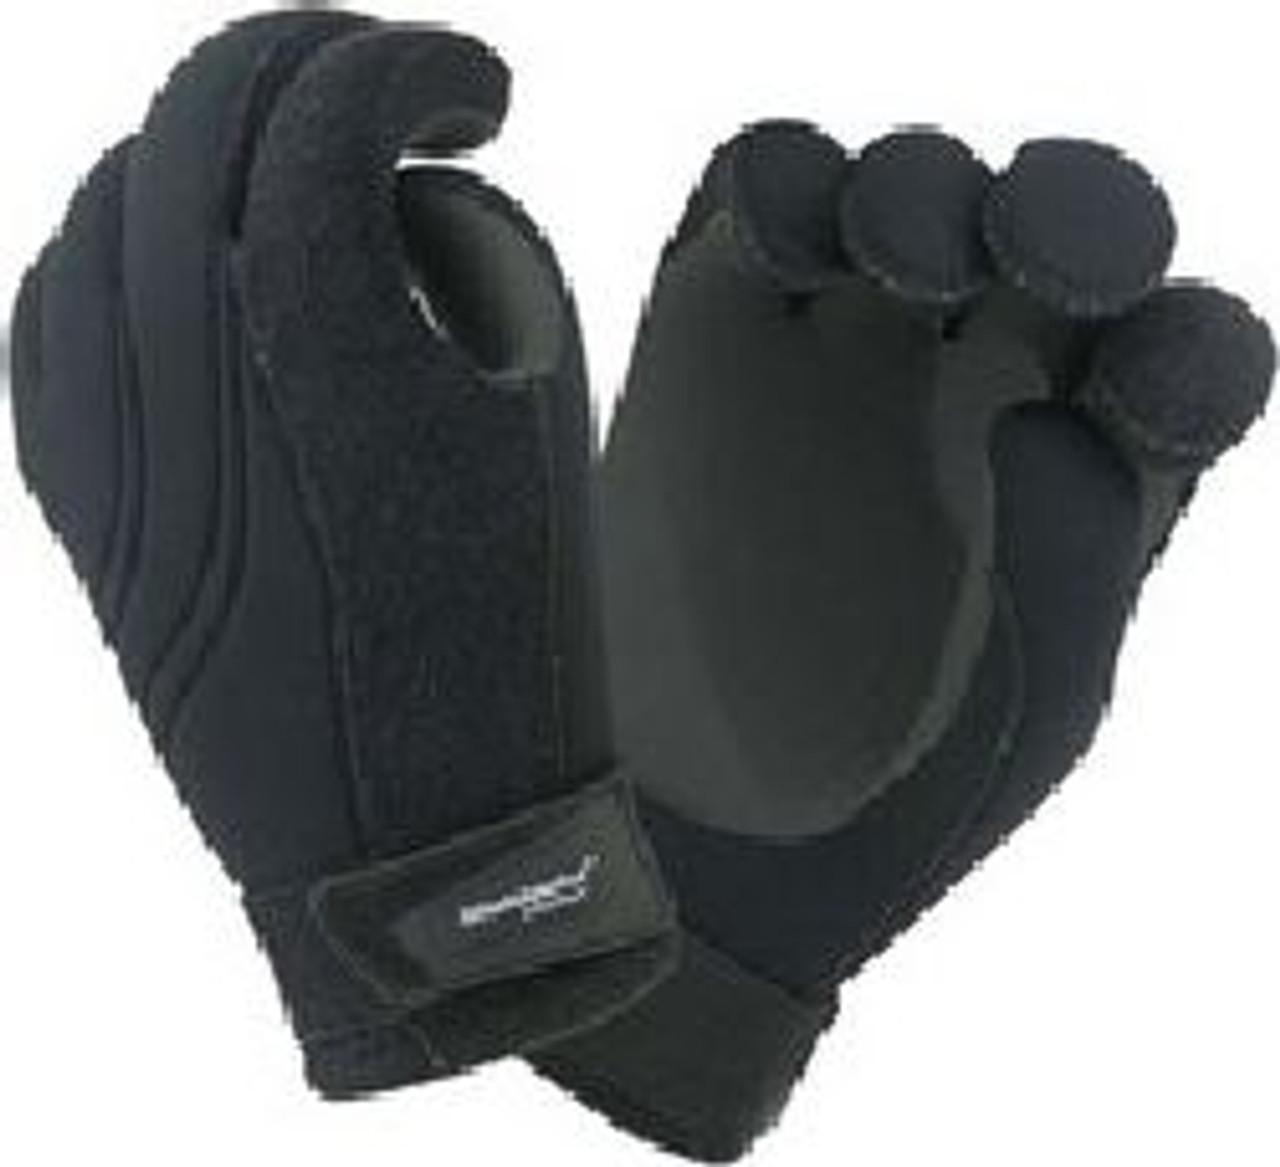 Stohlquist Men's MAW Gloves